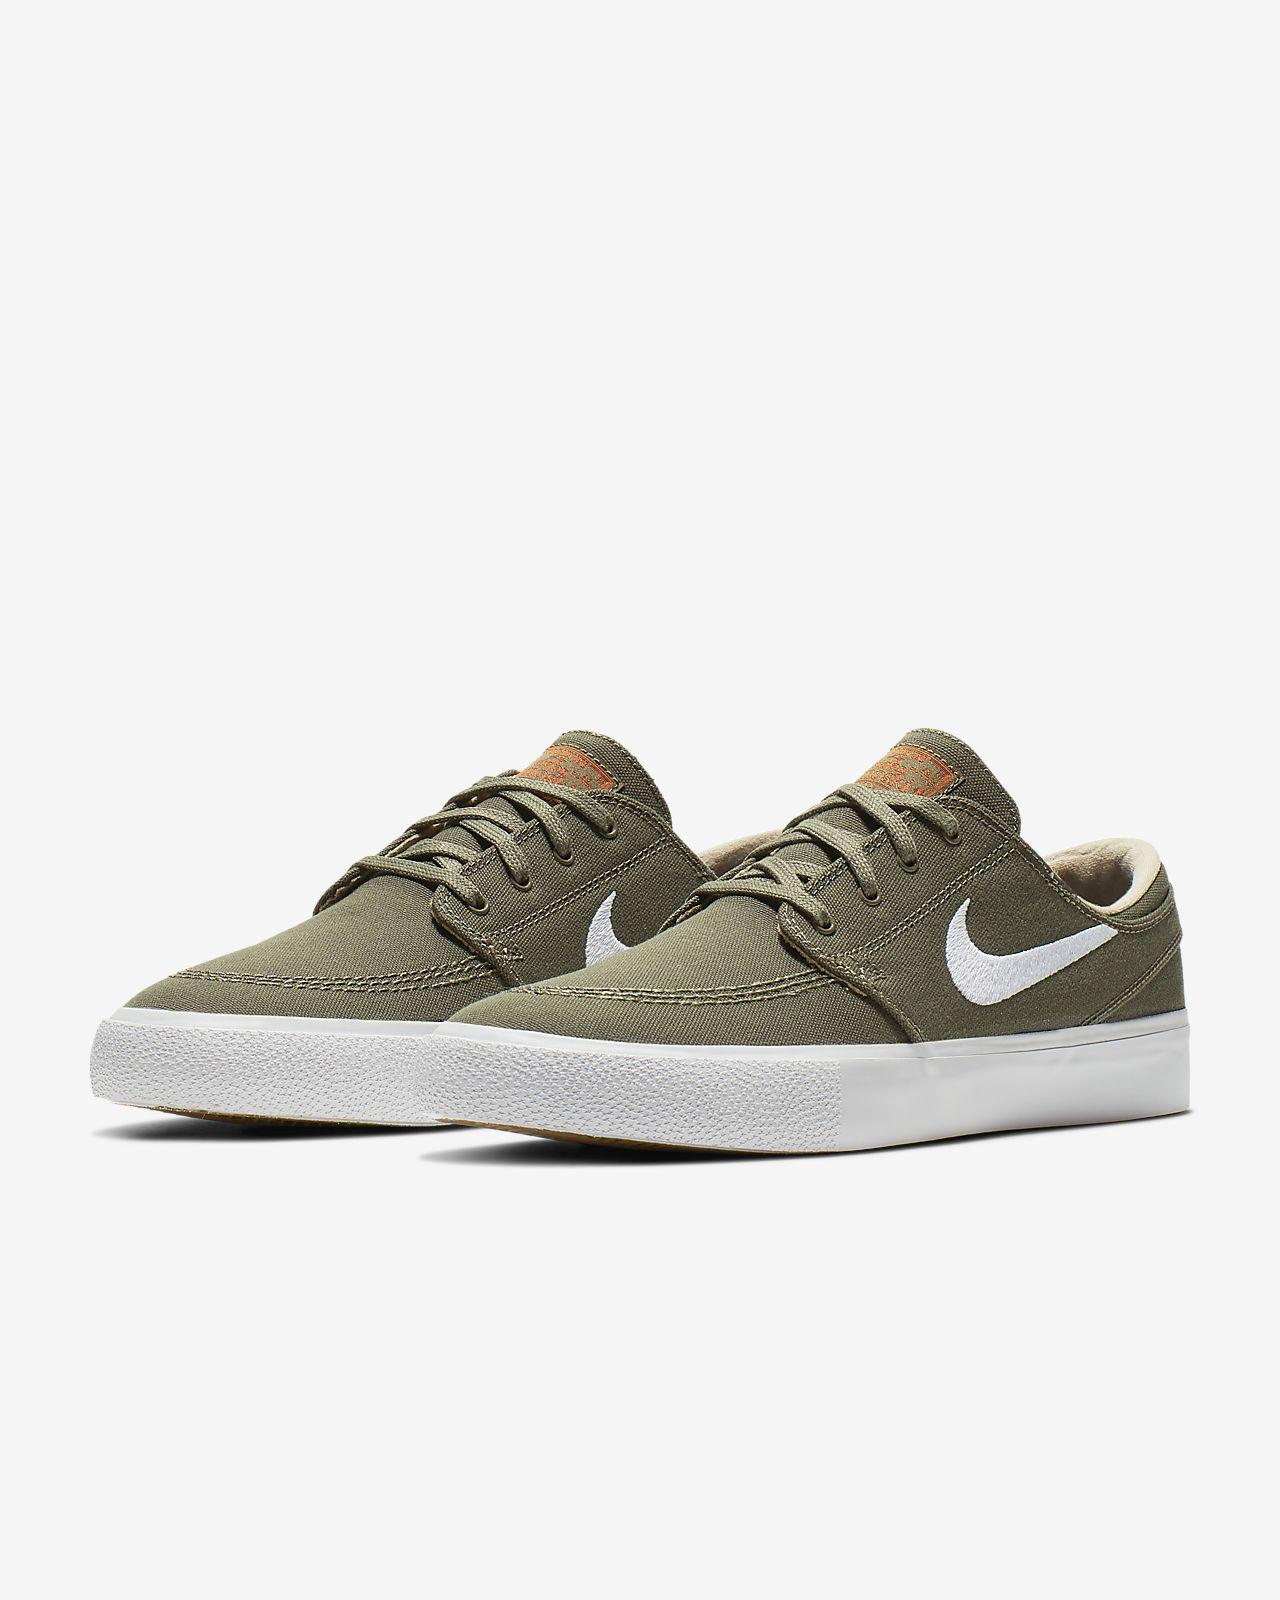 Sb Stefan Chaussure De Skateboard Canvas Nike Zoom Janoski Rm DWHYe2E9Ib